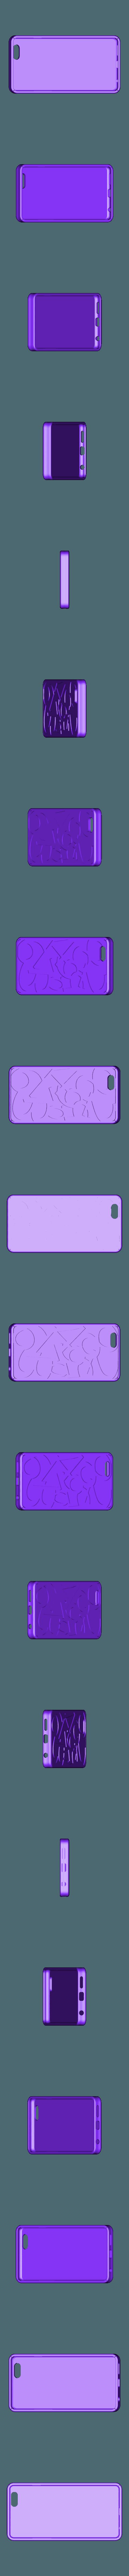 iphone6s_case_107_1piece.stl Download free STL file iPhone6 case • Design to 3D print, tofuji